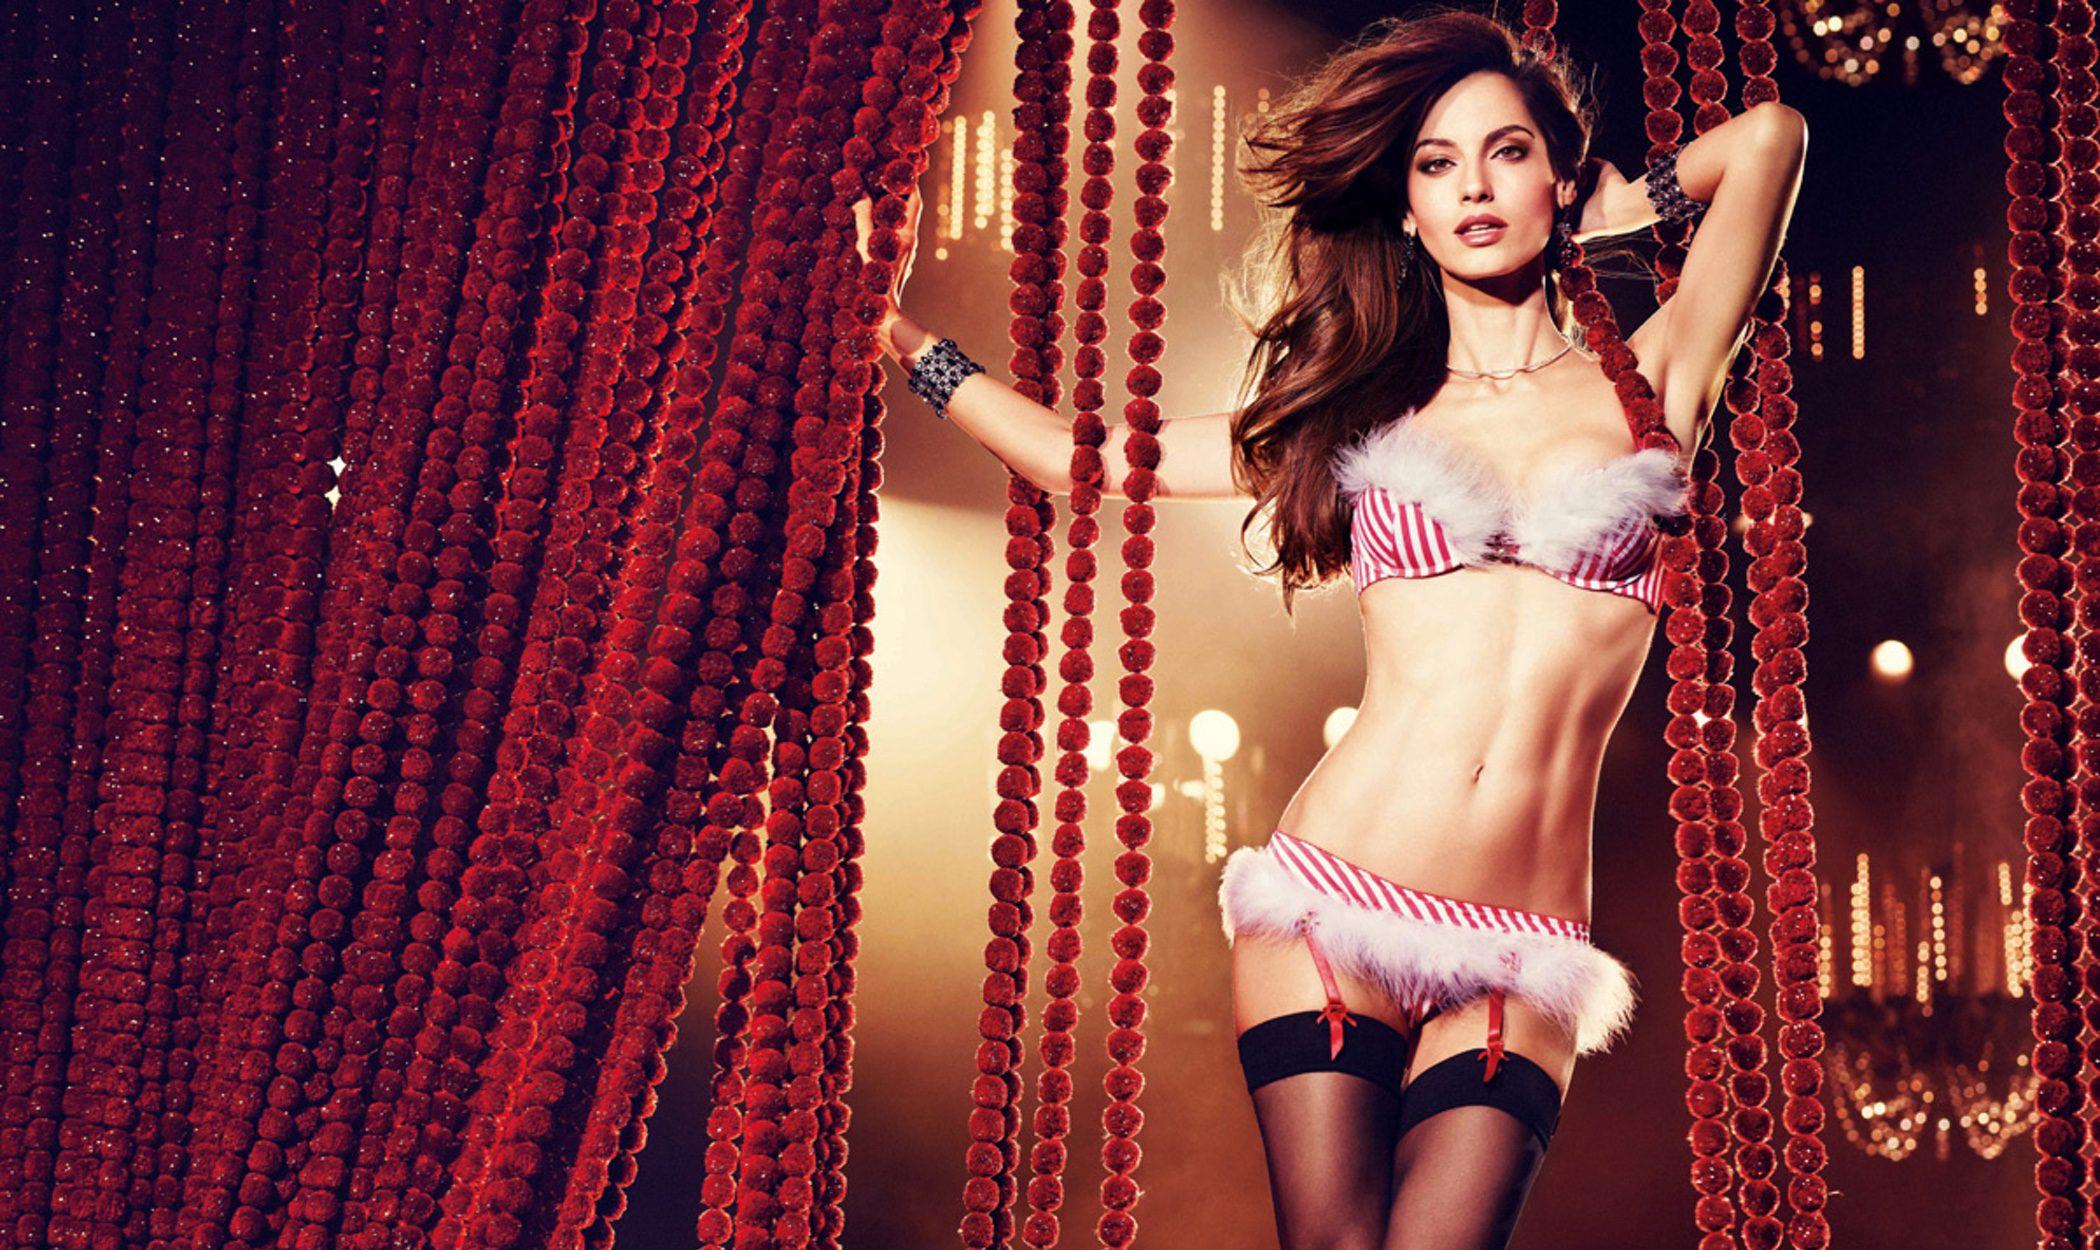 Ariadne Artiles celebra la Navidad 2012 posando muy sexy para Yamamay